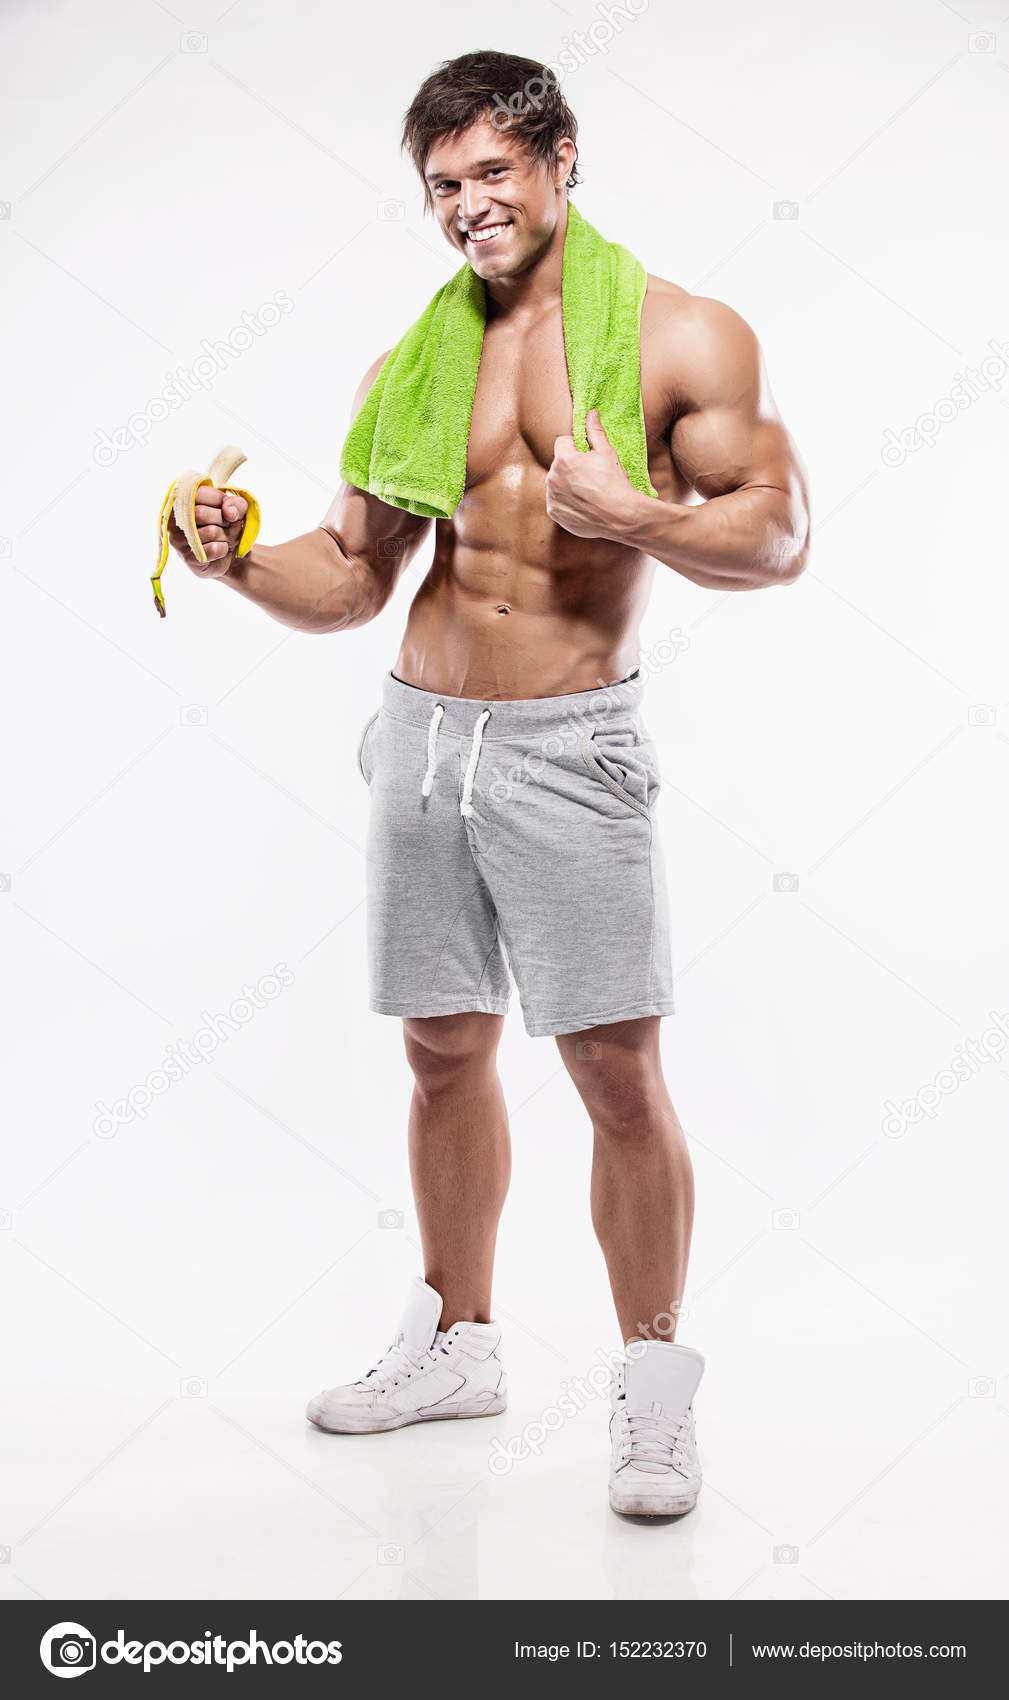 schlanker Körpertyp Mann